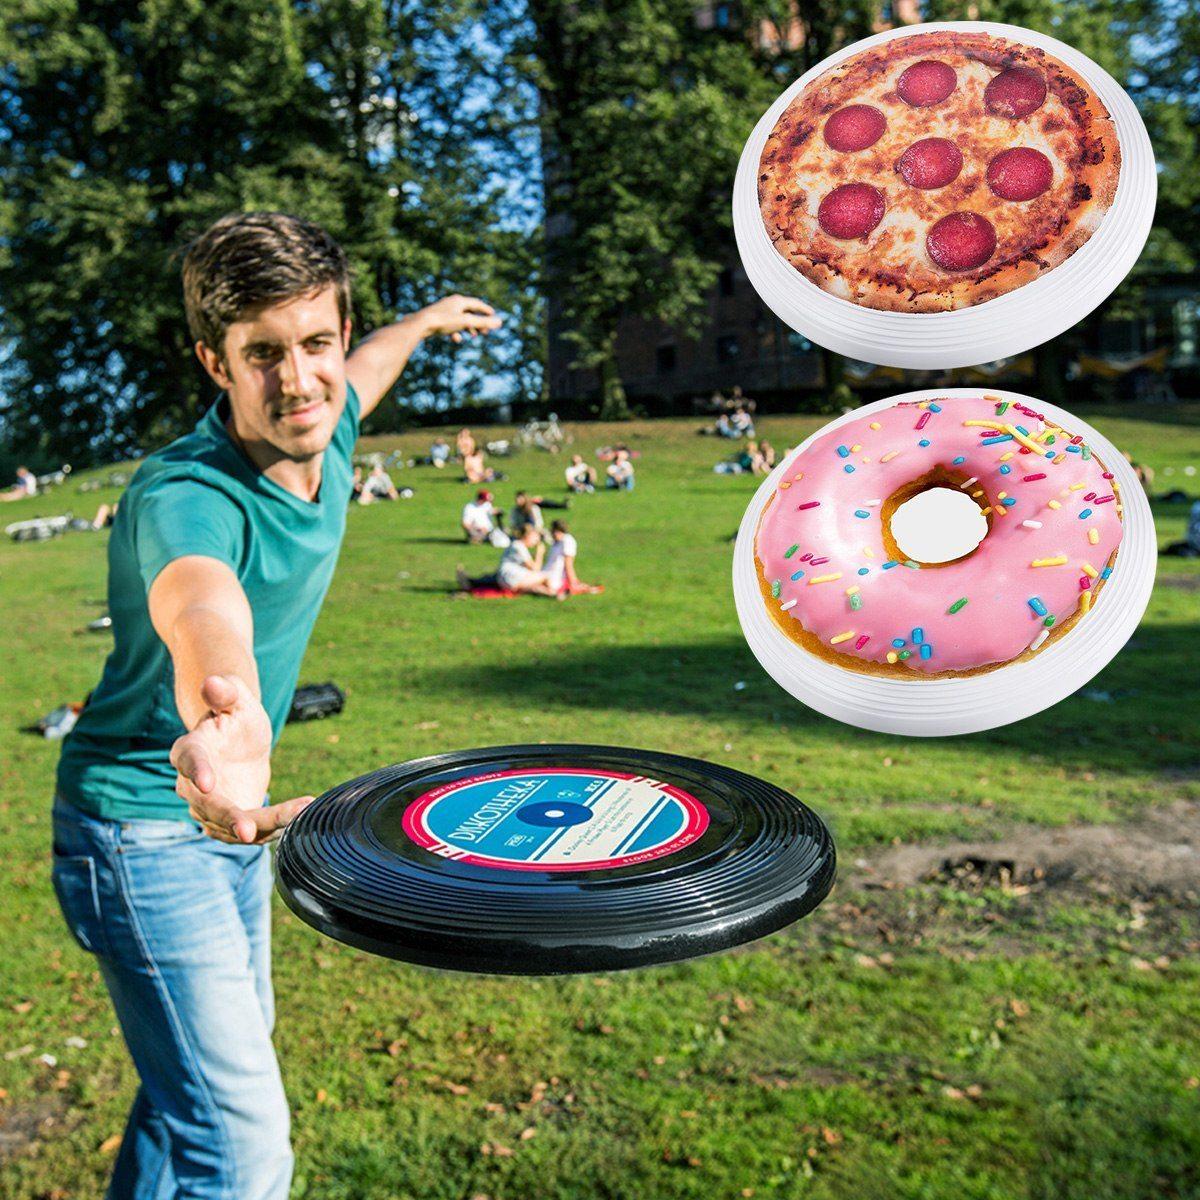 Pizza Donut Vinyl Frisbee